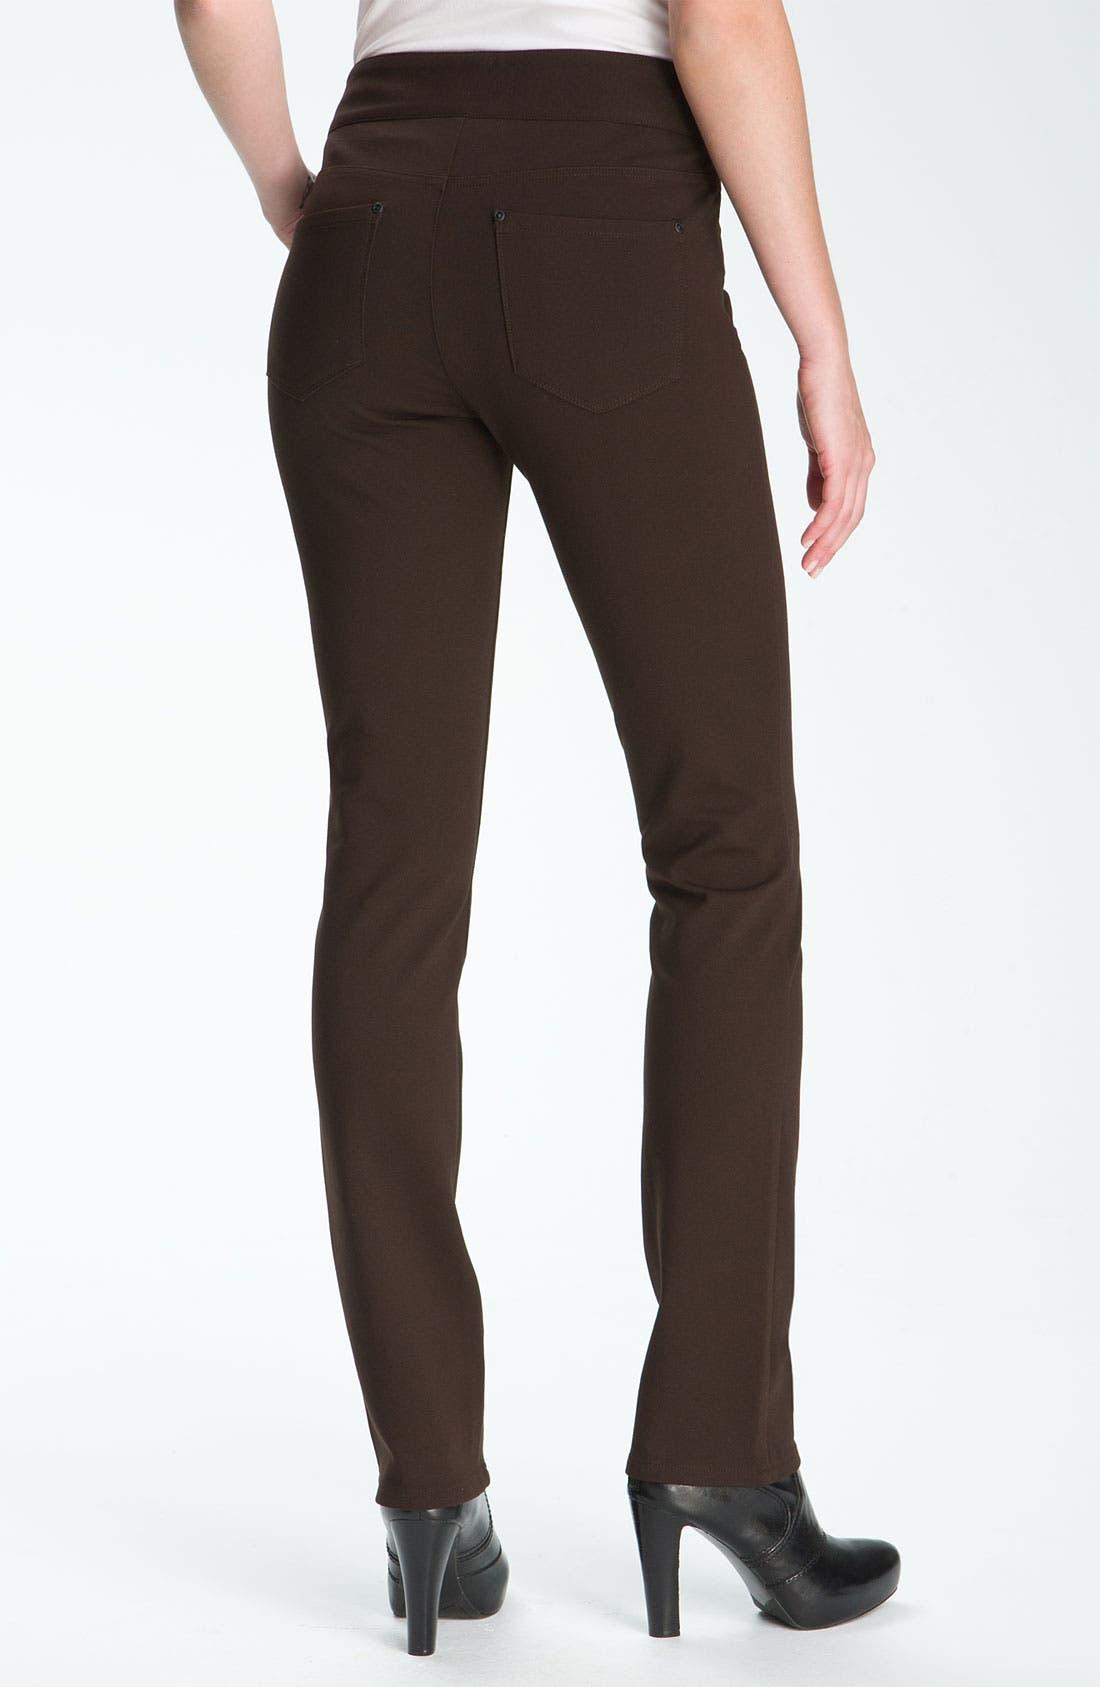 Main Image - NYDJ 'Natasha' Skinny Ponte Pants (Petite)